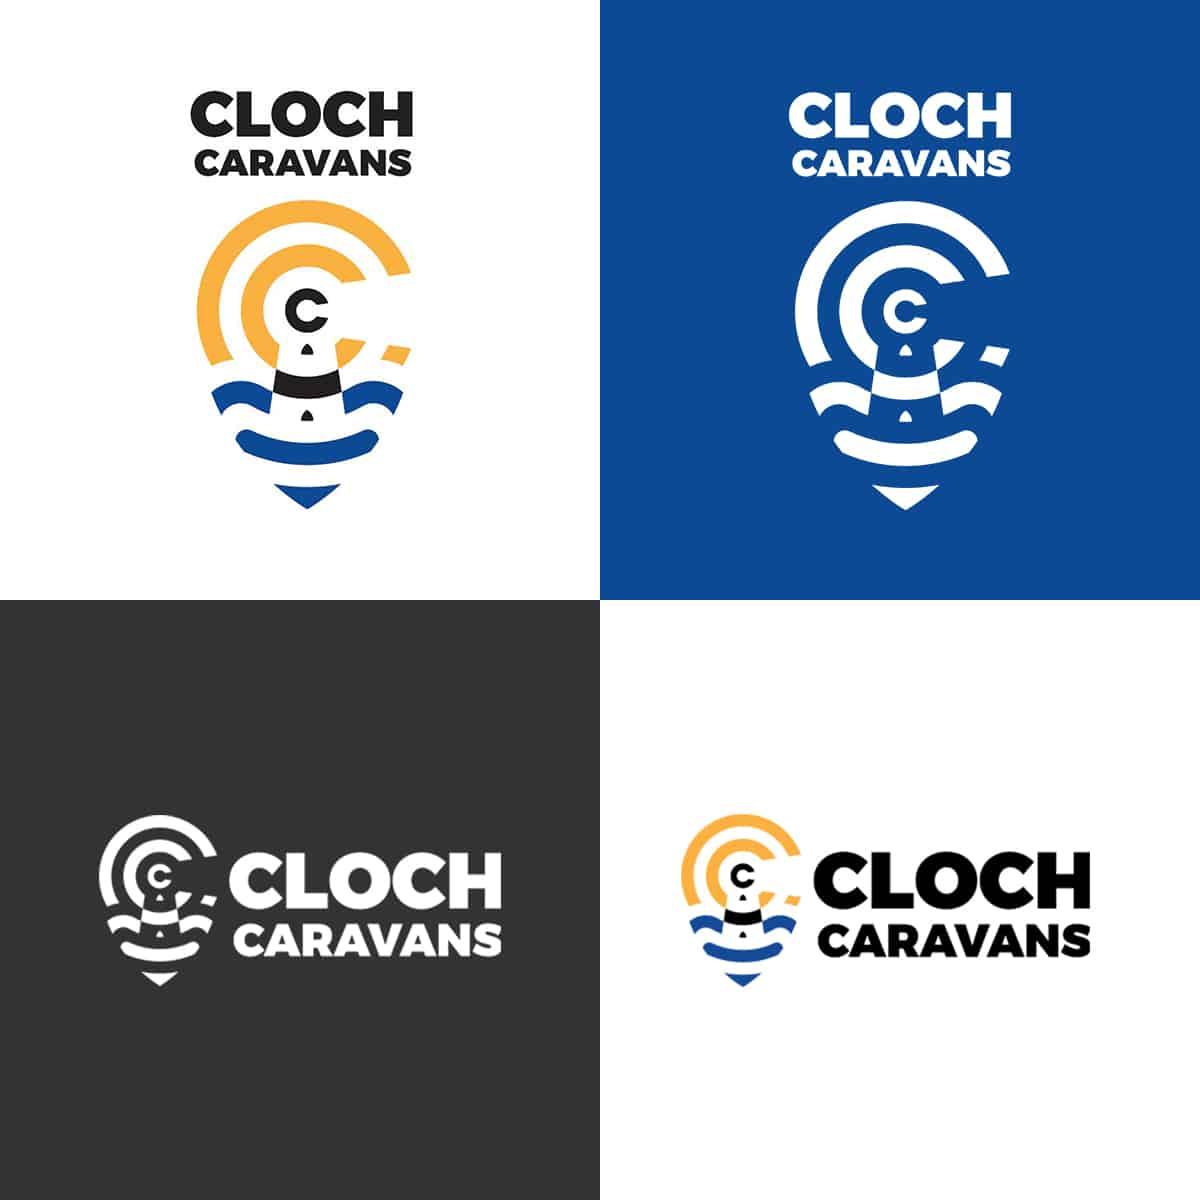 design of brand identity for Cloch Caravans